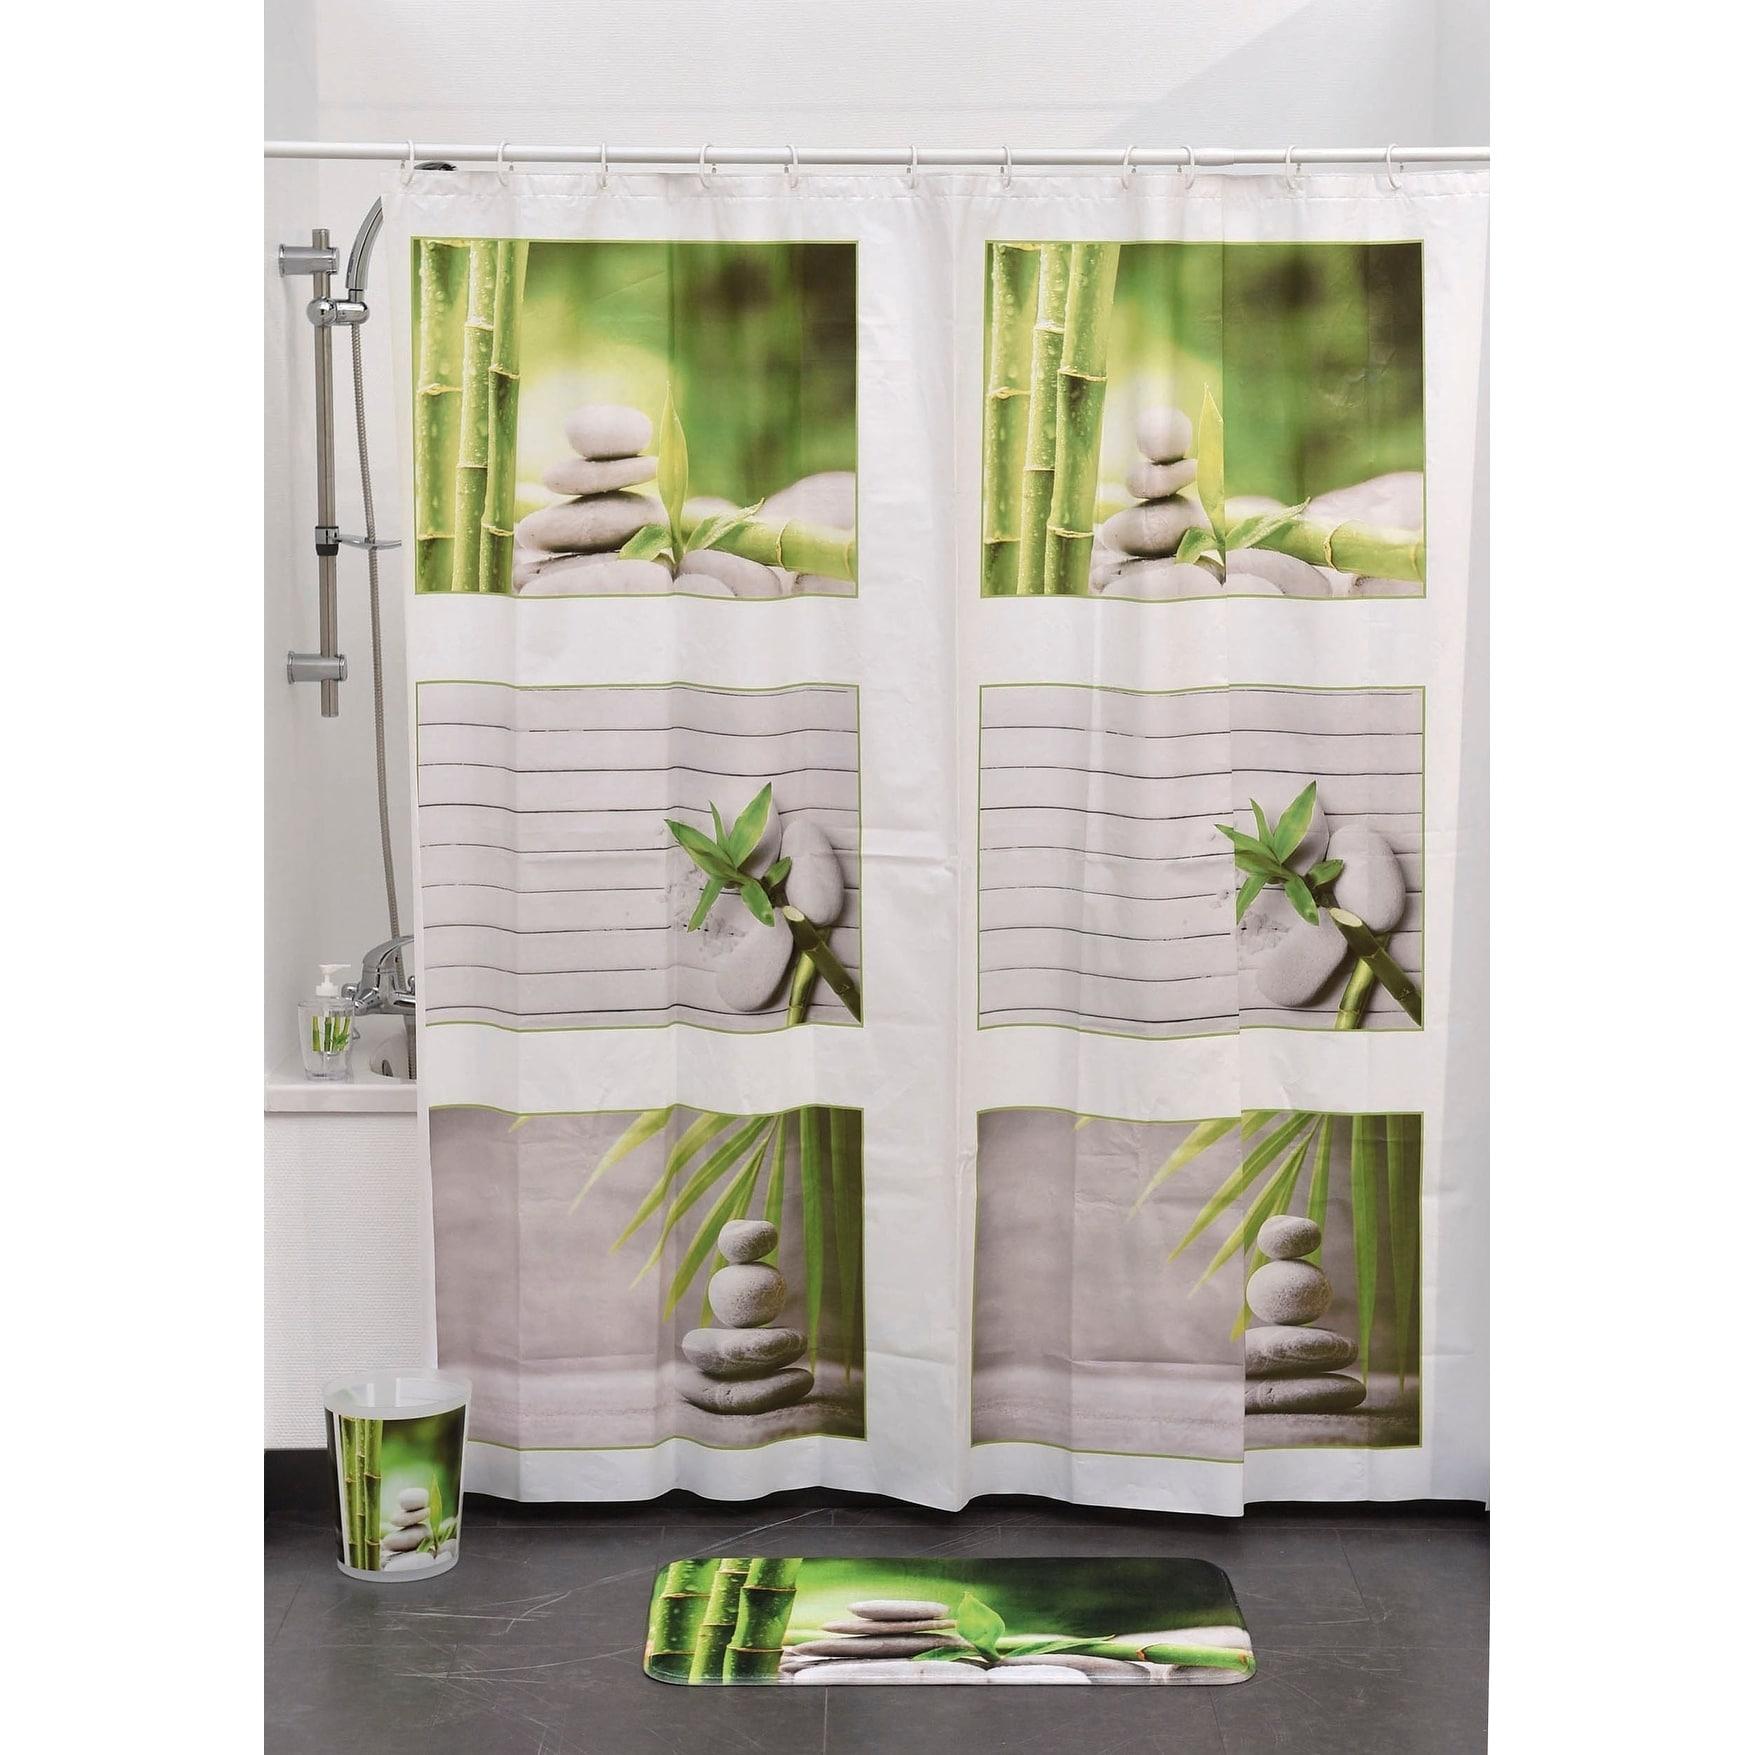 Shop Evideco Bathroom Printed Peva Liner Shower Curtain Zen and Co ...